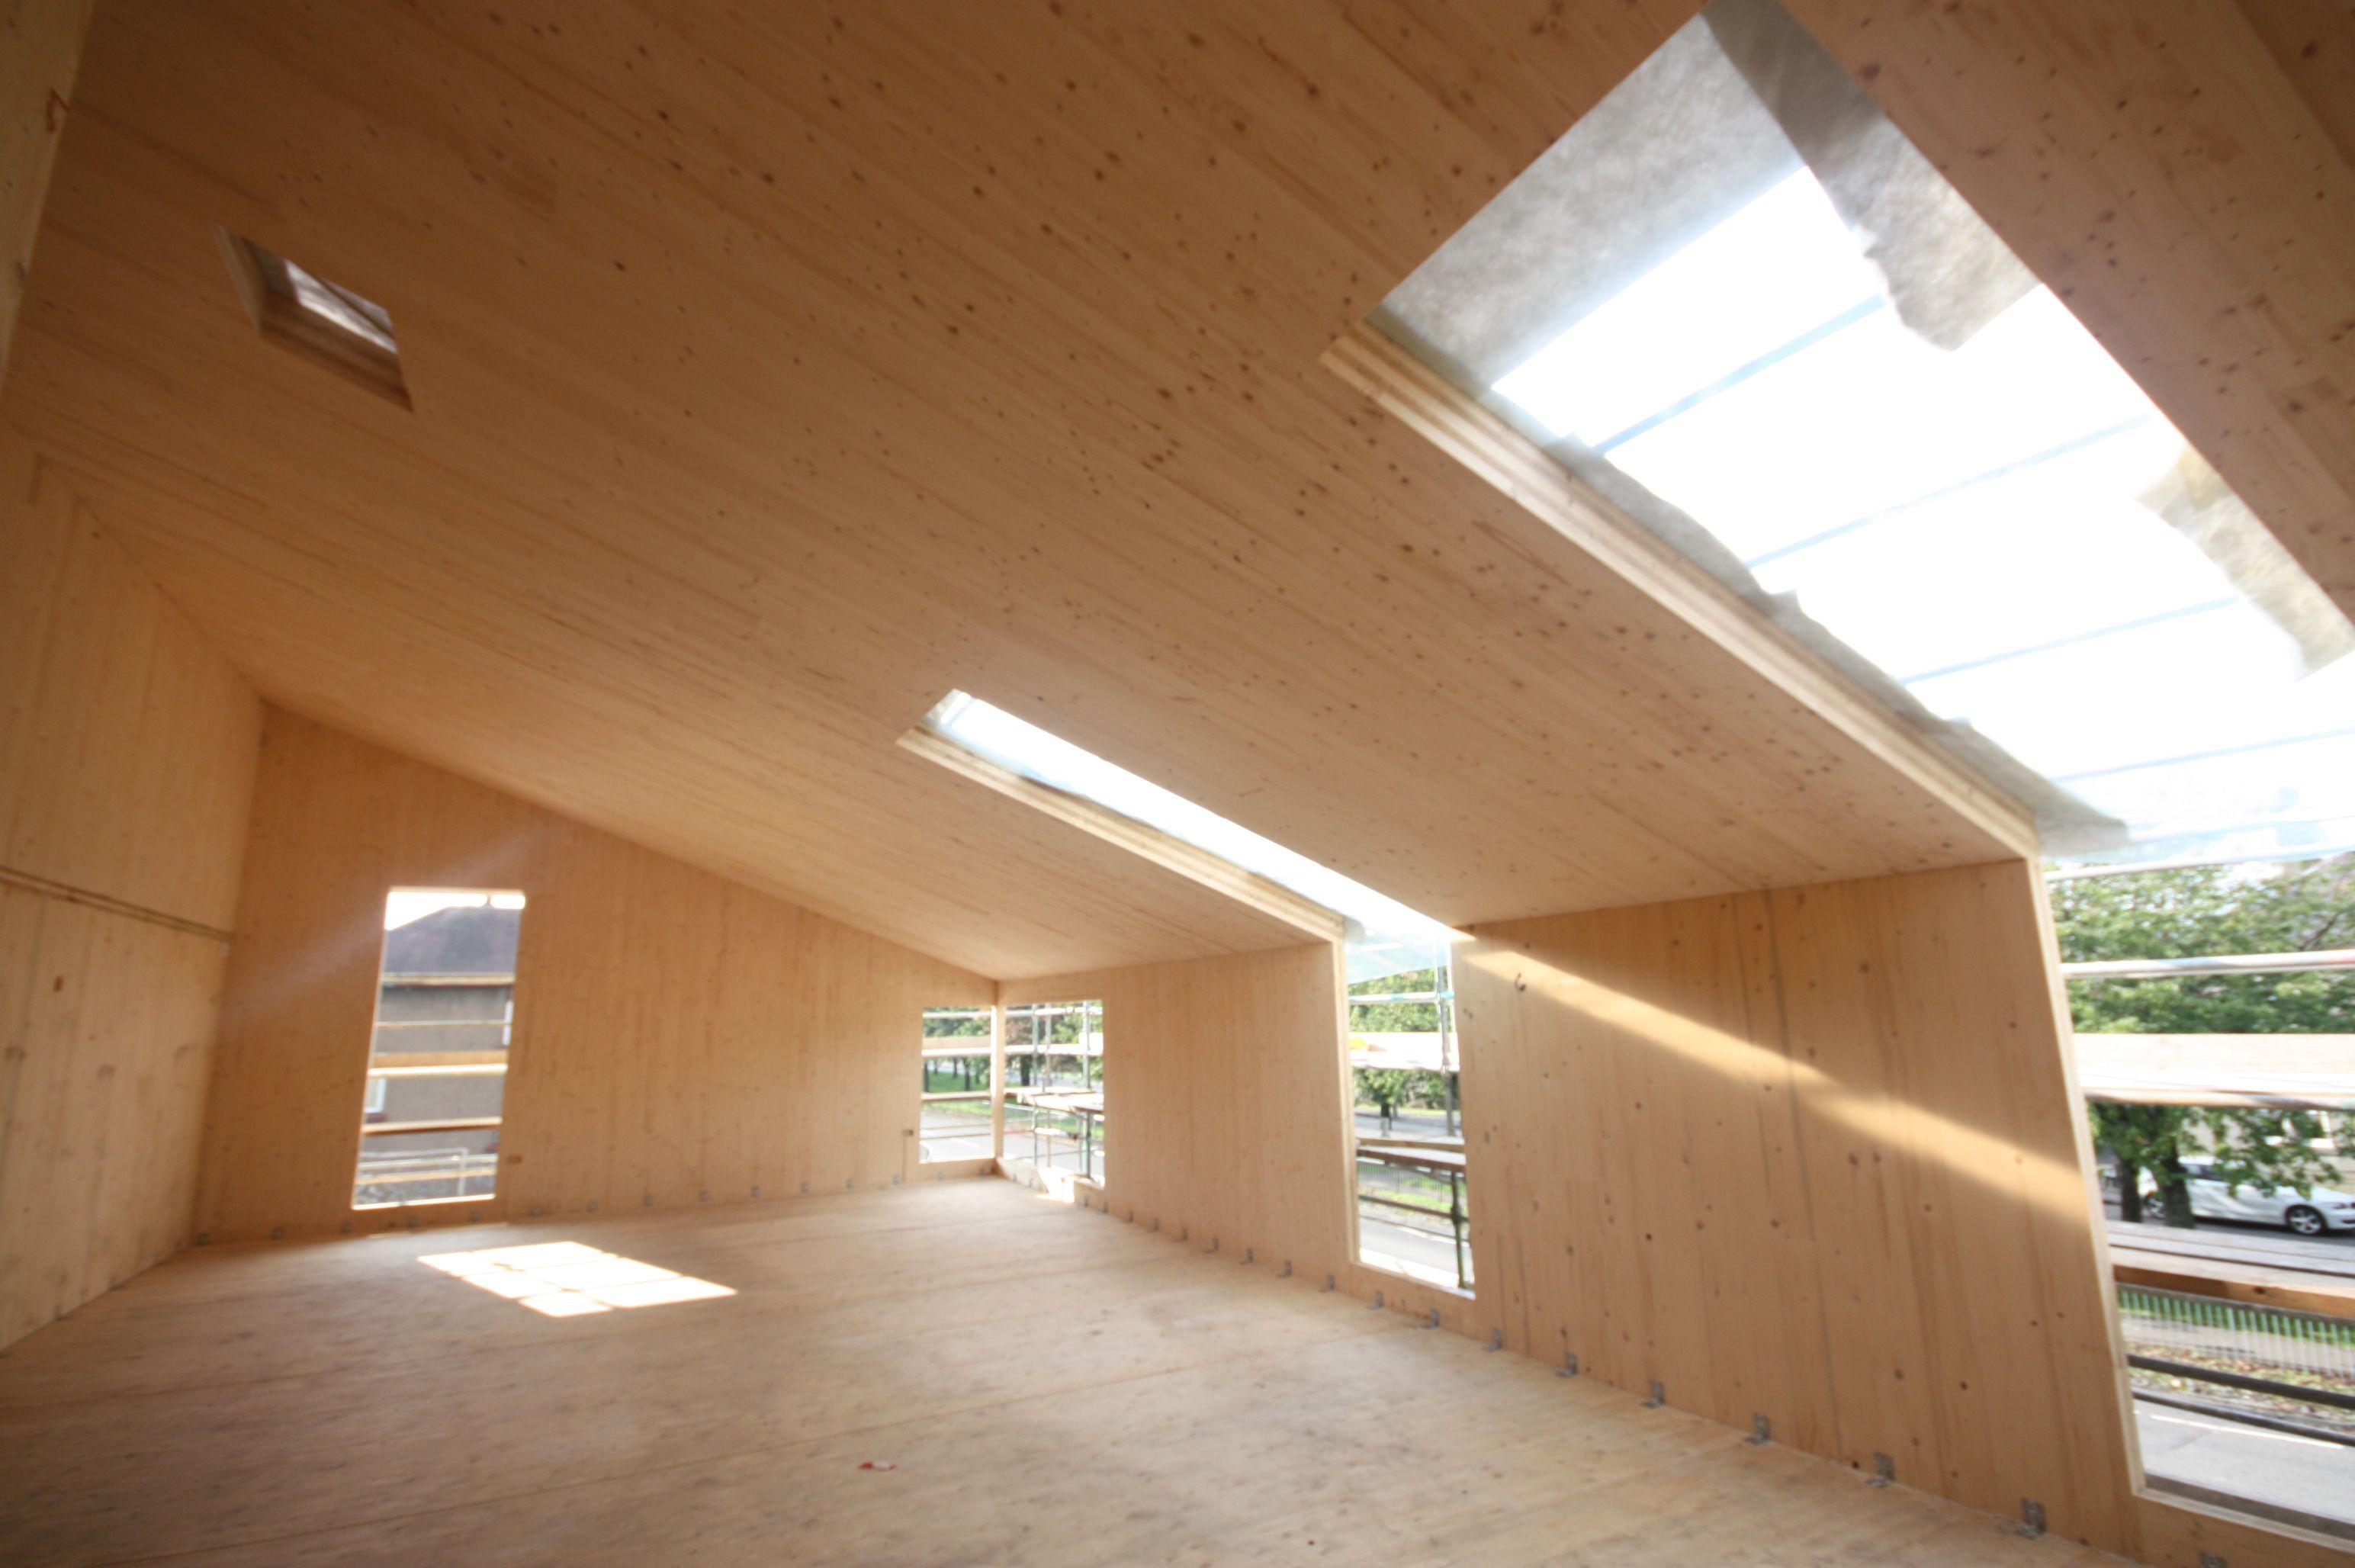 Isolare La Casa Basaluzzo clt roofs - google search | timber house, clt, hotels design